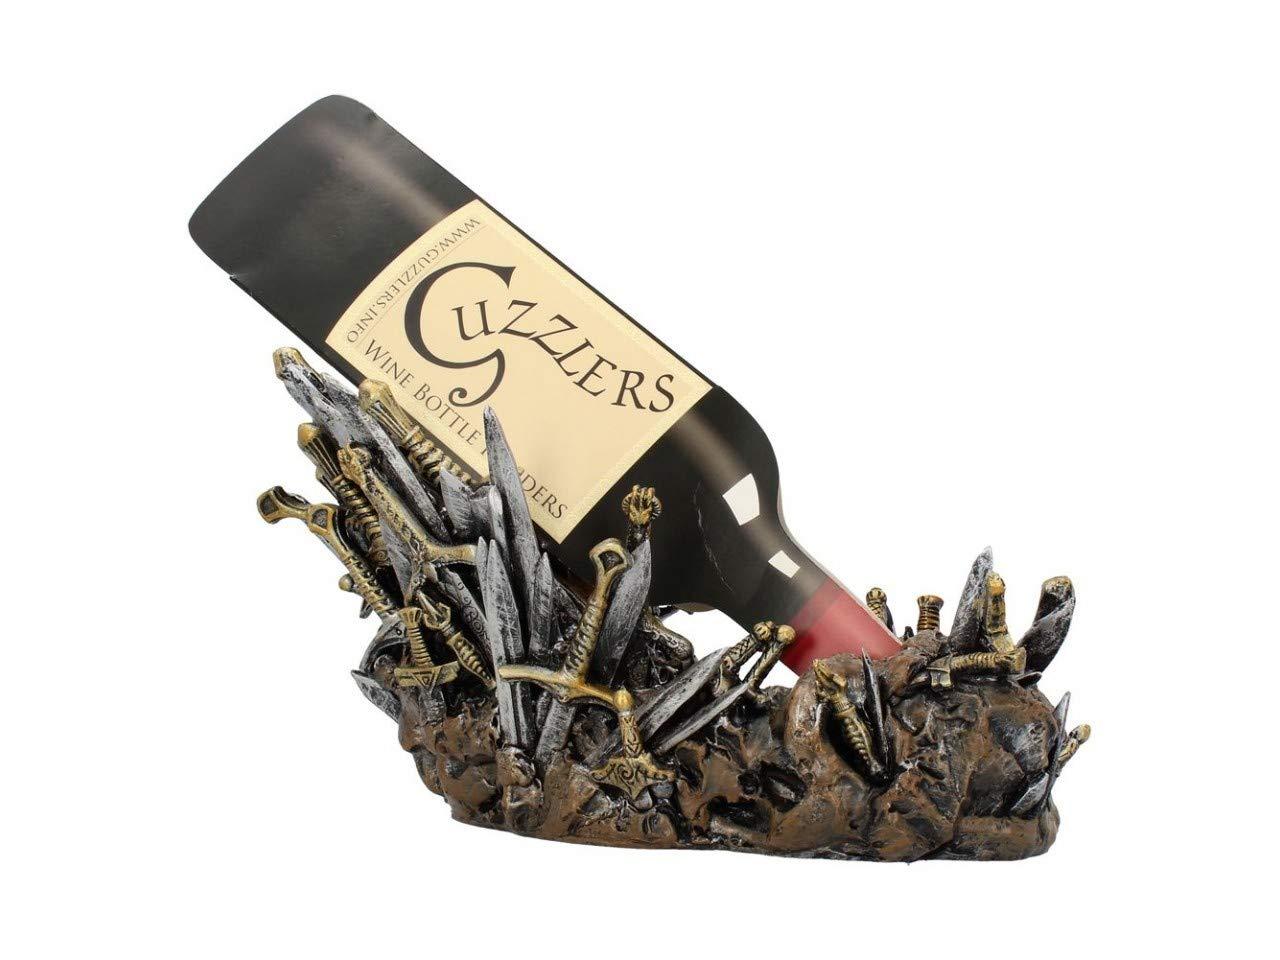 Weird Or Wonderful Guzzler Wine Bottle Holder - Swords - Novelty Gift Present Alcohol Kitchen Accessory Rack Medieval GoT Games Of Thrones